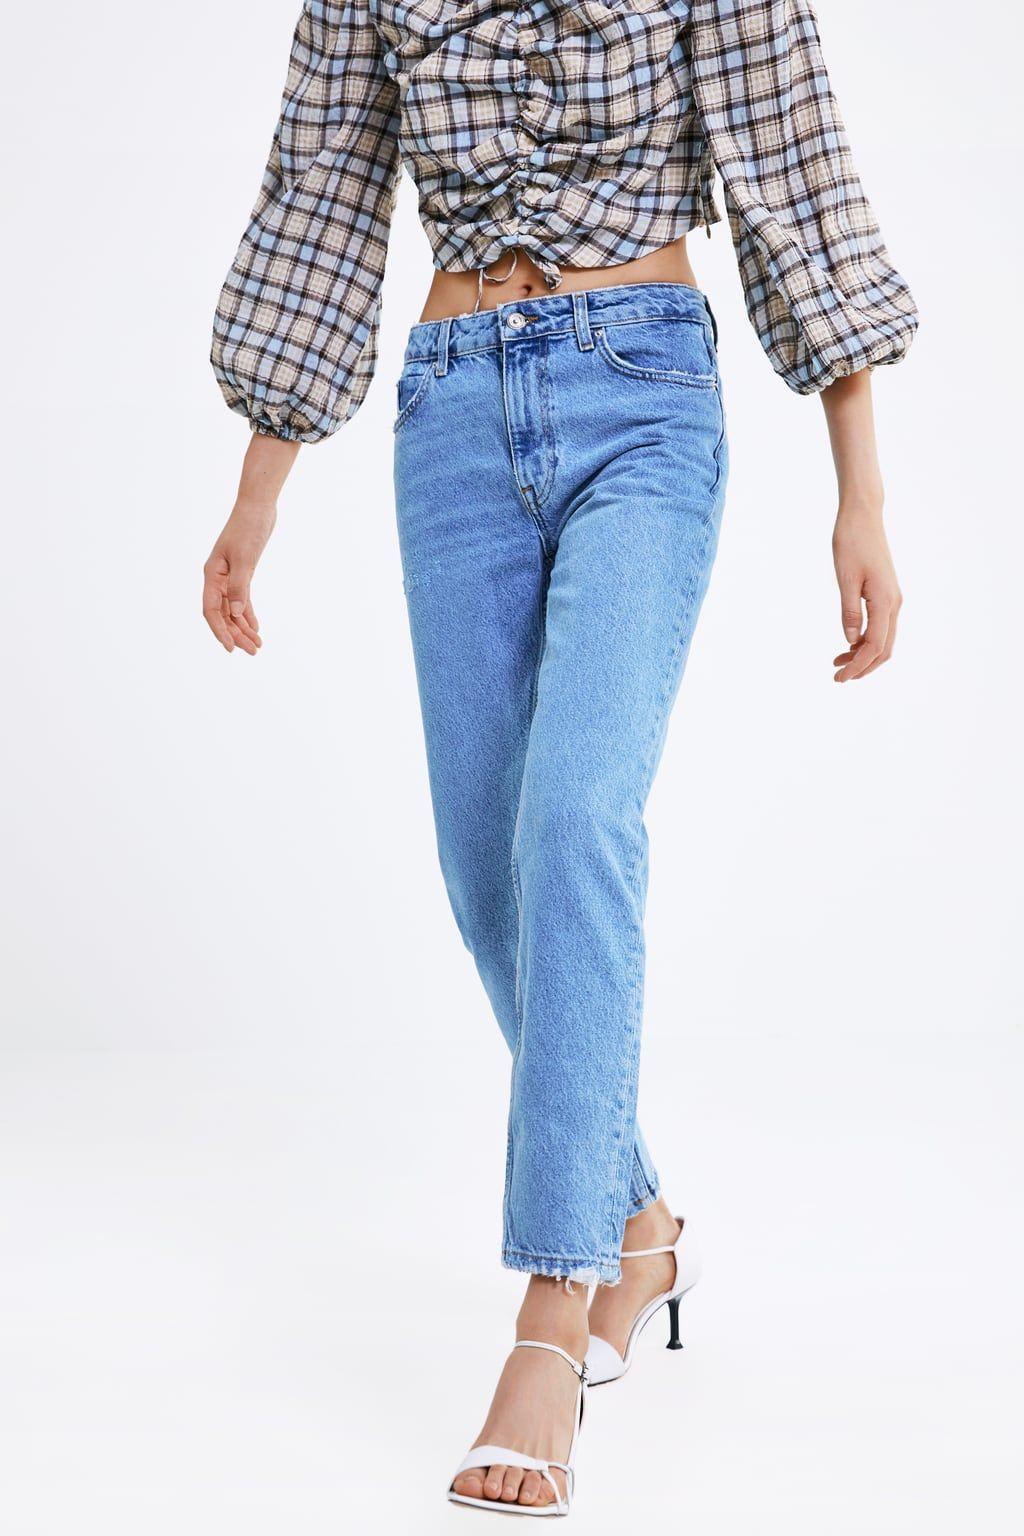 5a03b192 Z1975 mom jeans in 2019 | Zara | Jeans, Mom jeans, Jeans fit